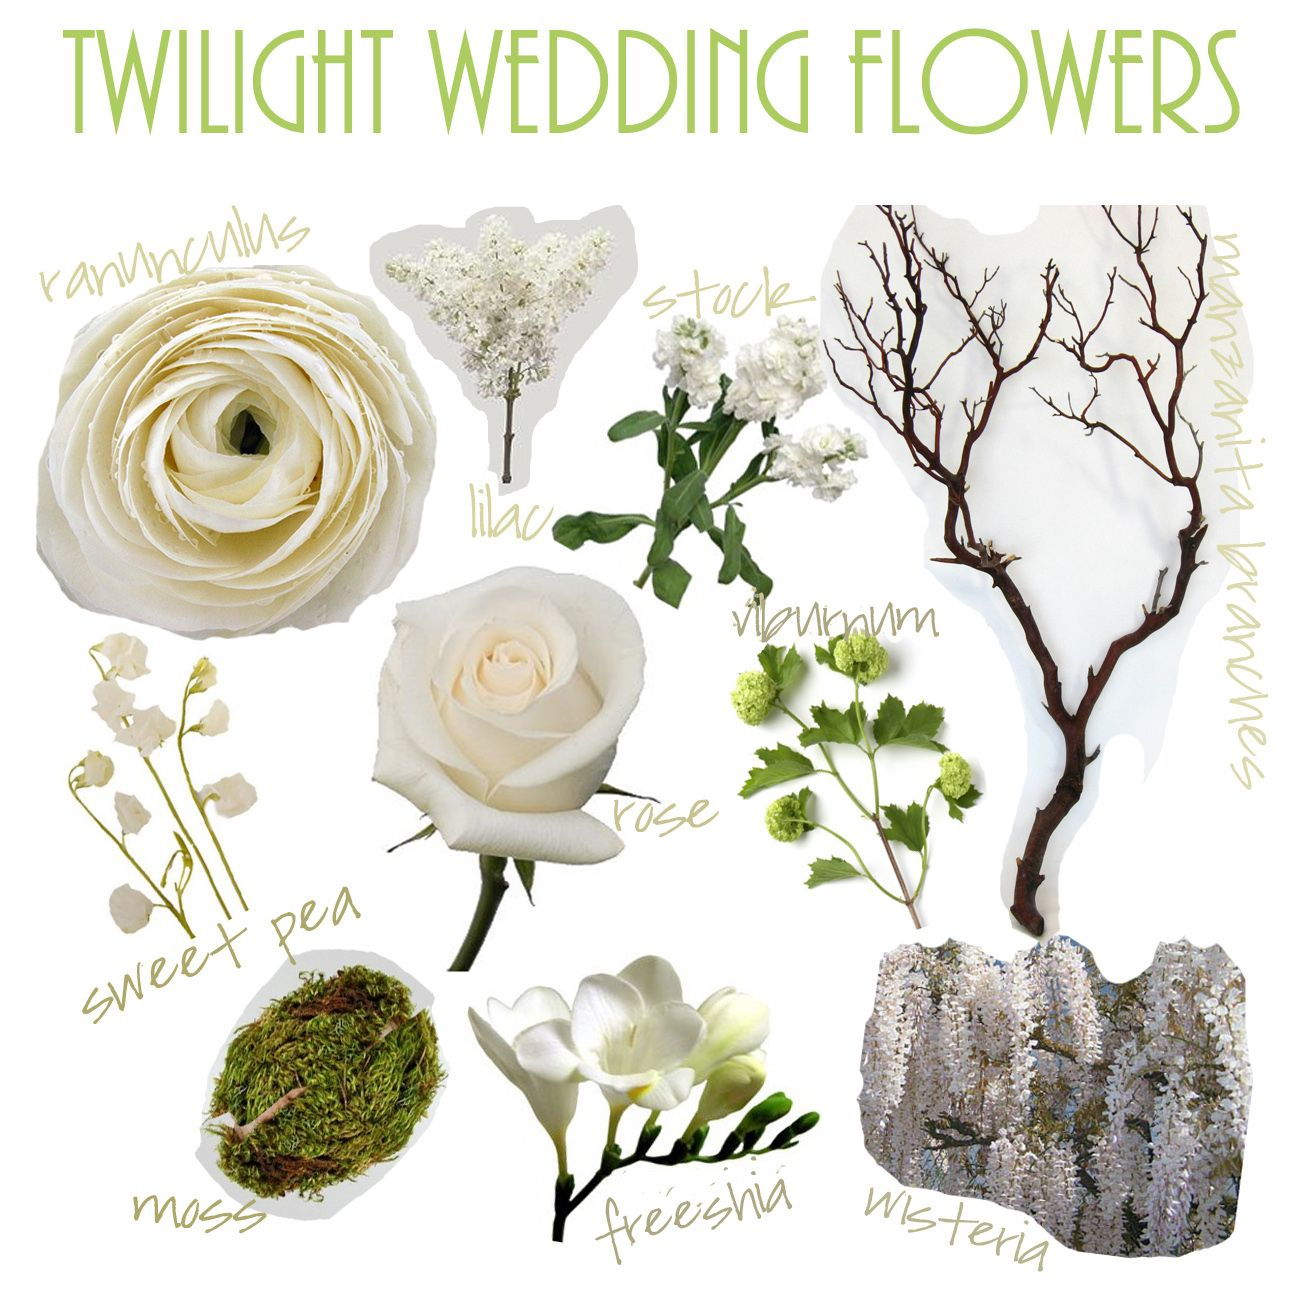 White Wedding Flowers Names Twilight Wedding Flowers Tyin The